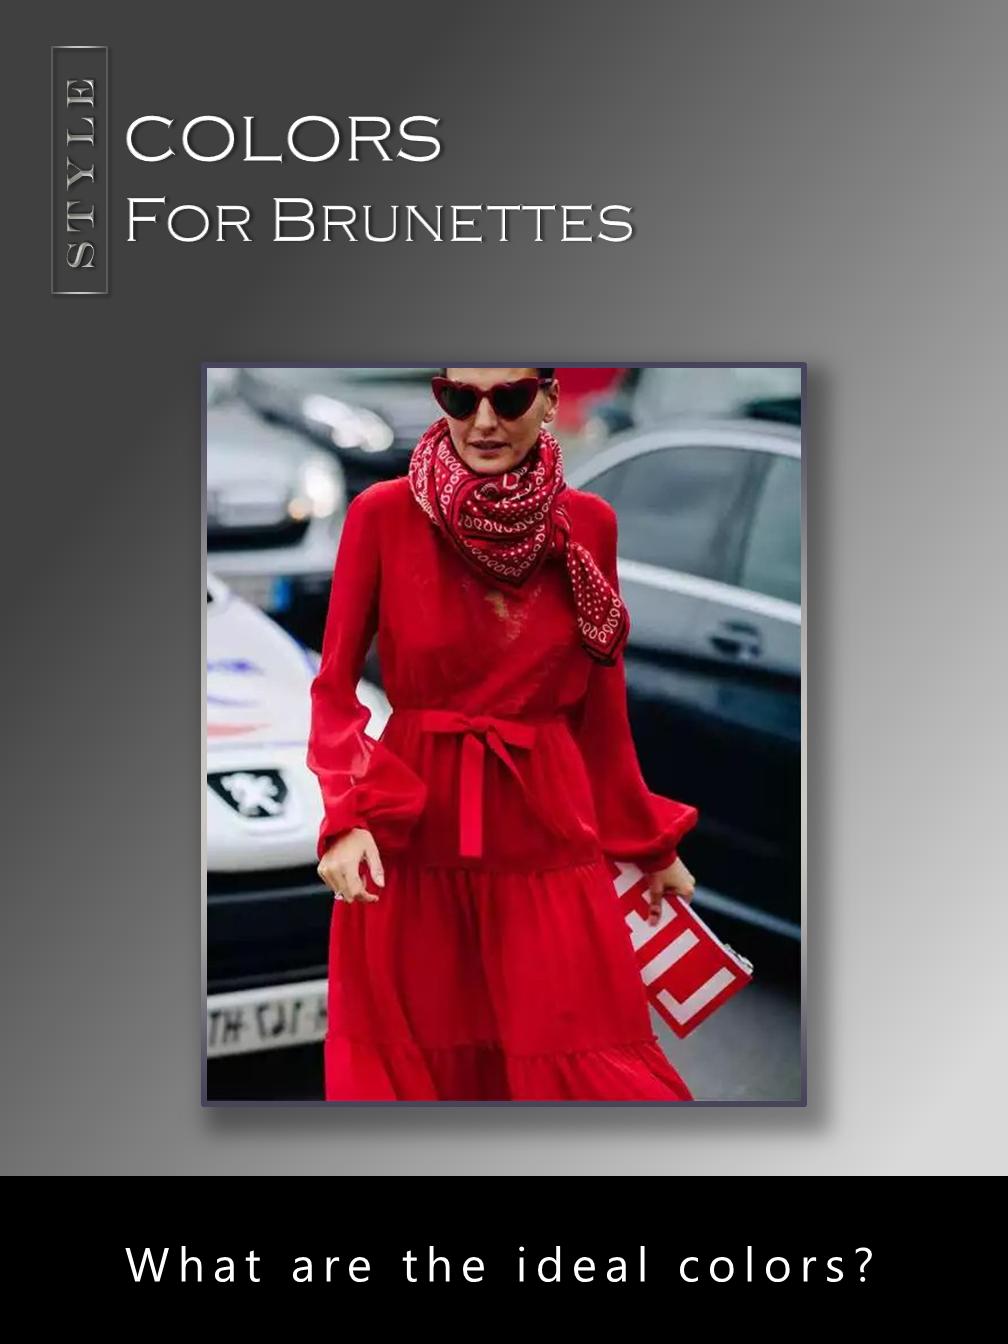 For Brunettes